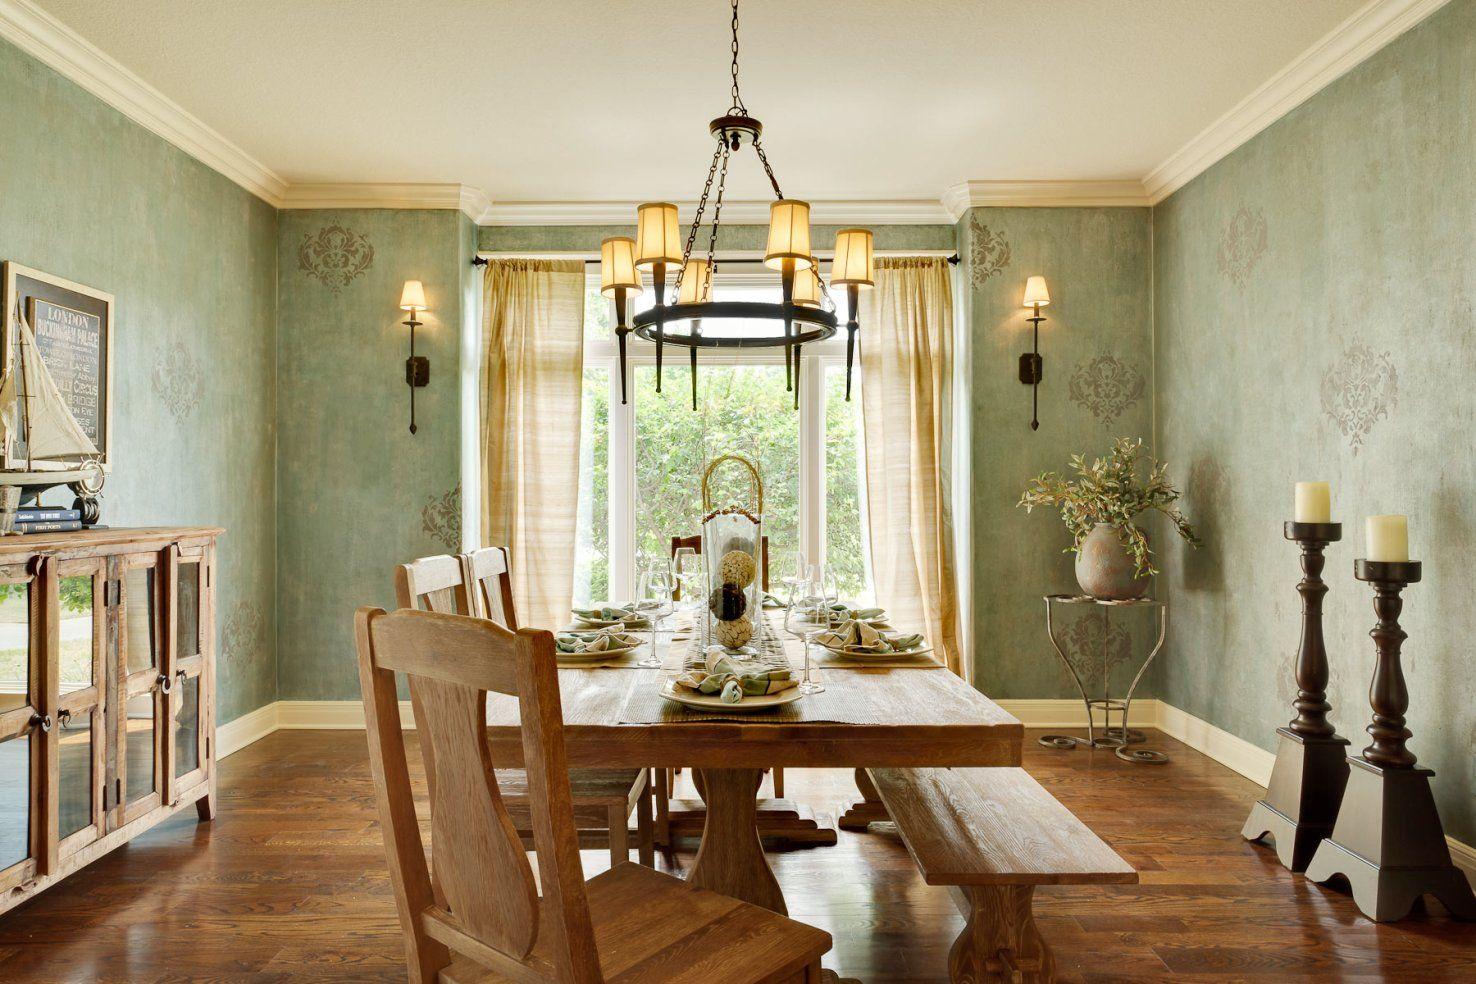 Coastal Dining Room Theme Decor For A Maximum Calmness And Peace